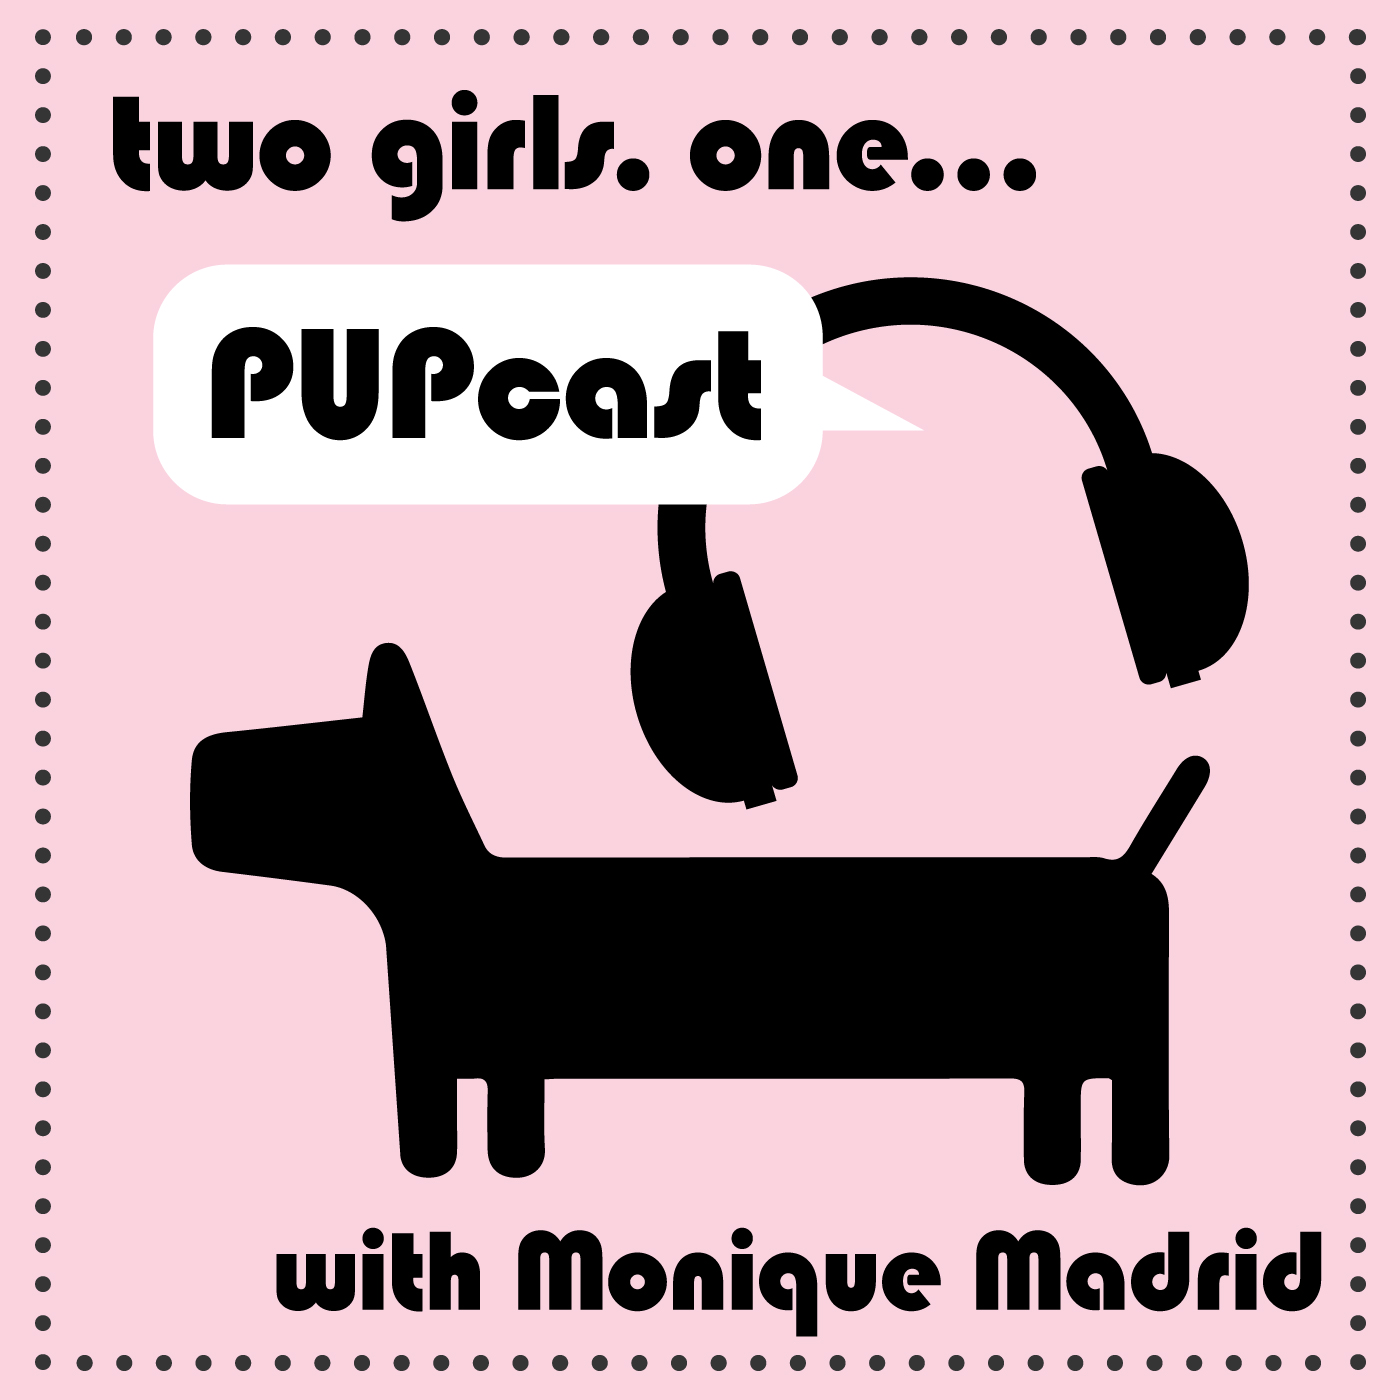 2 Girls 1 Pup Pupcast